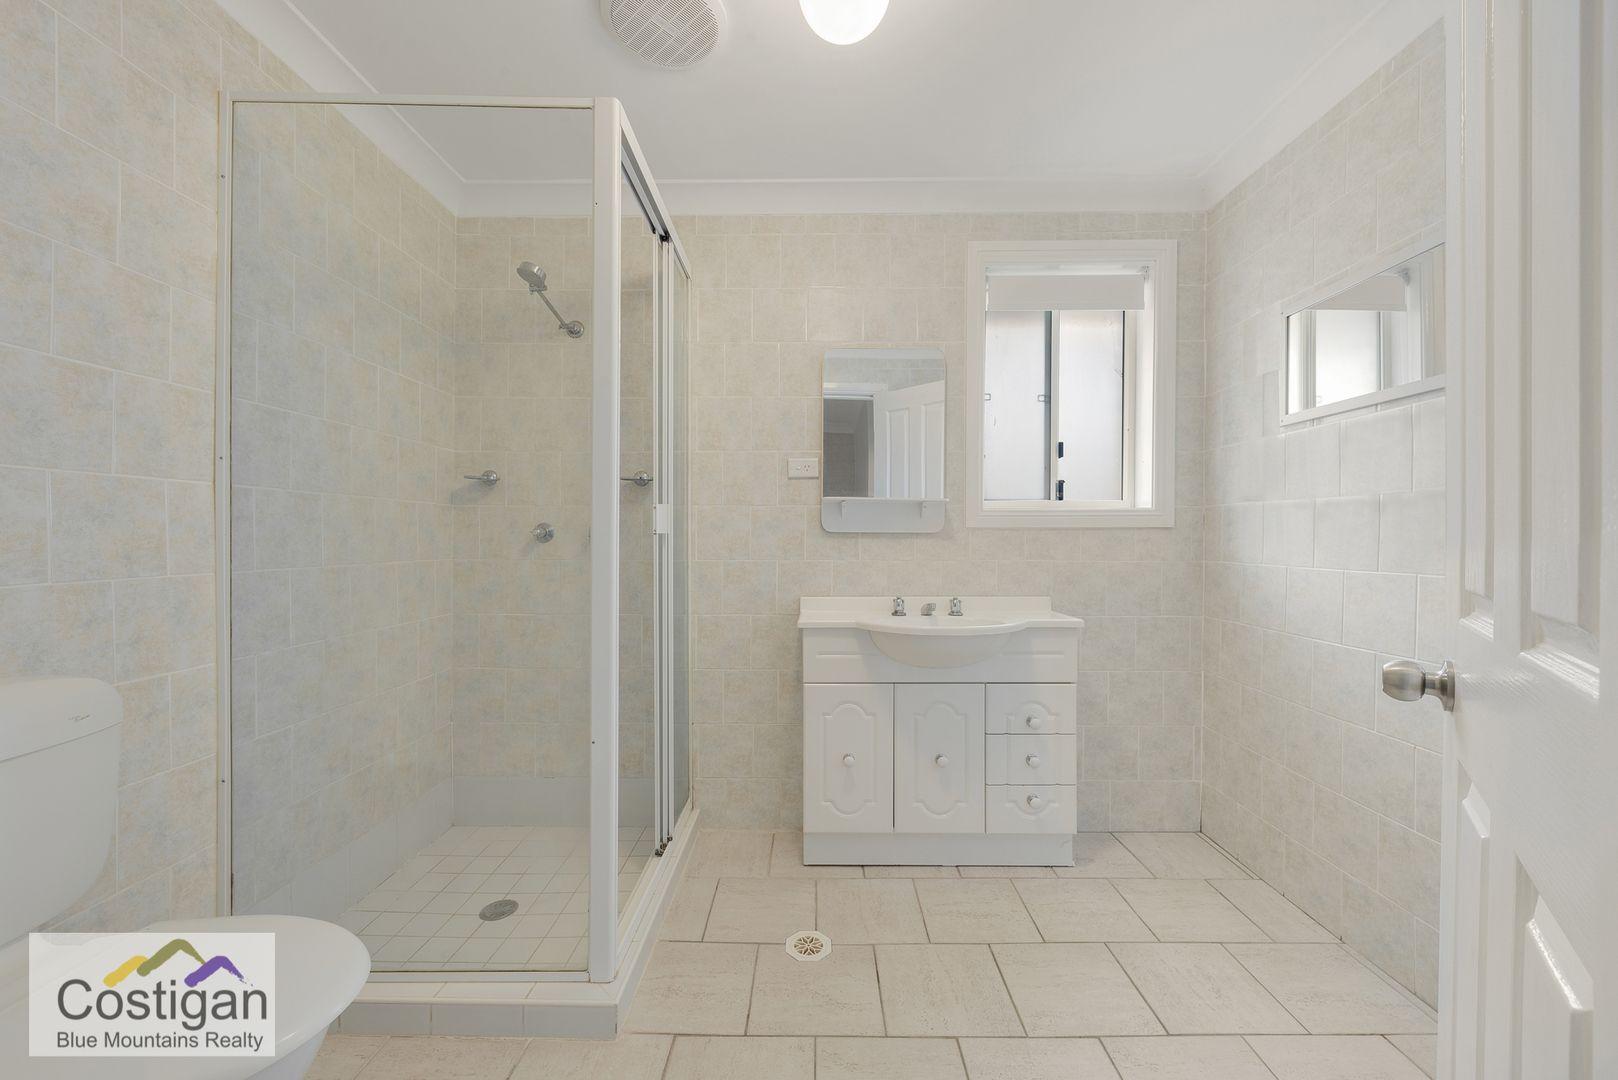 A/10 Eunoe St, Katoomba NSW 2780, Image 1